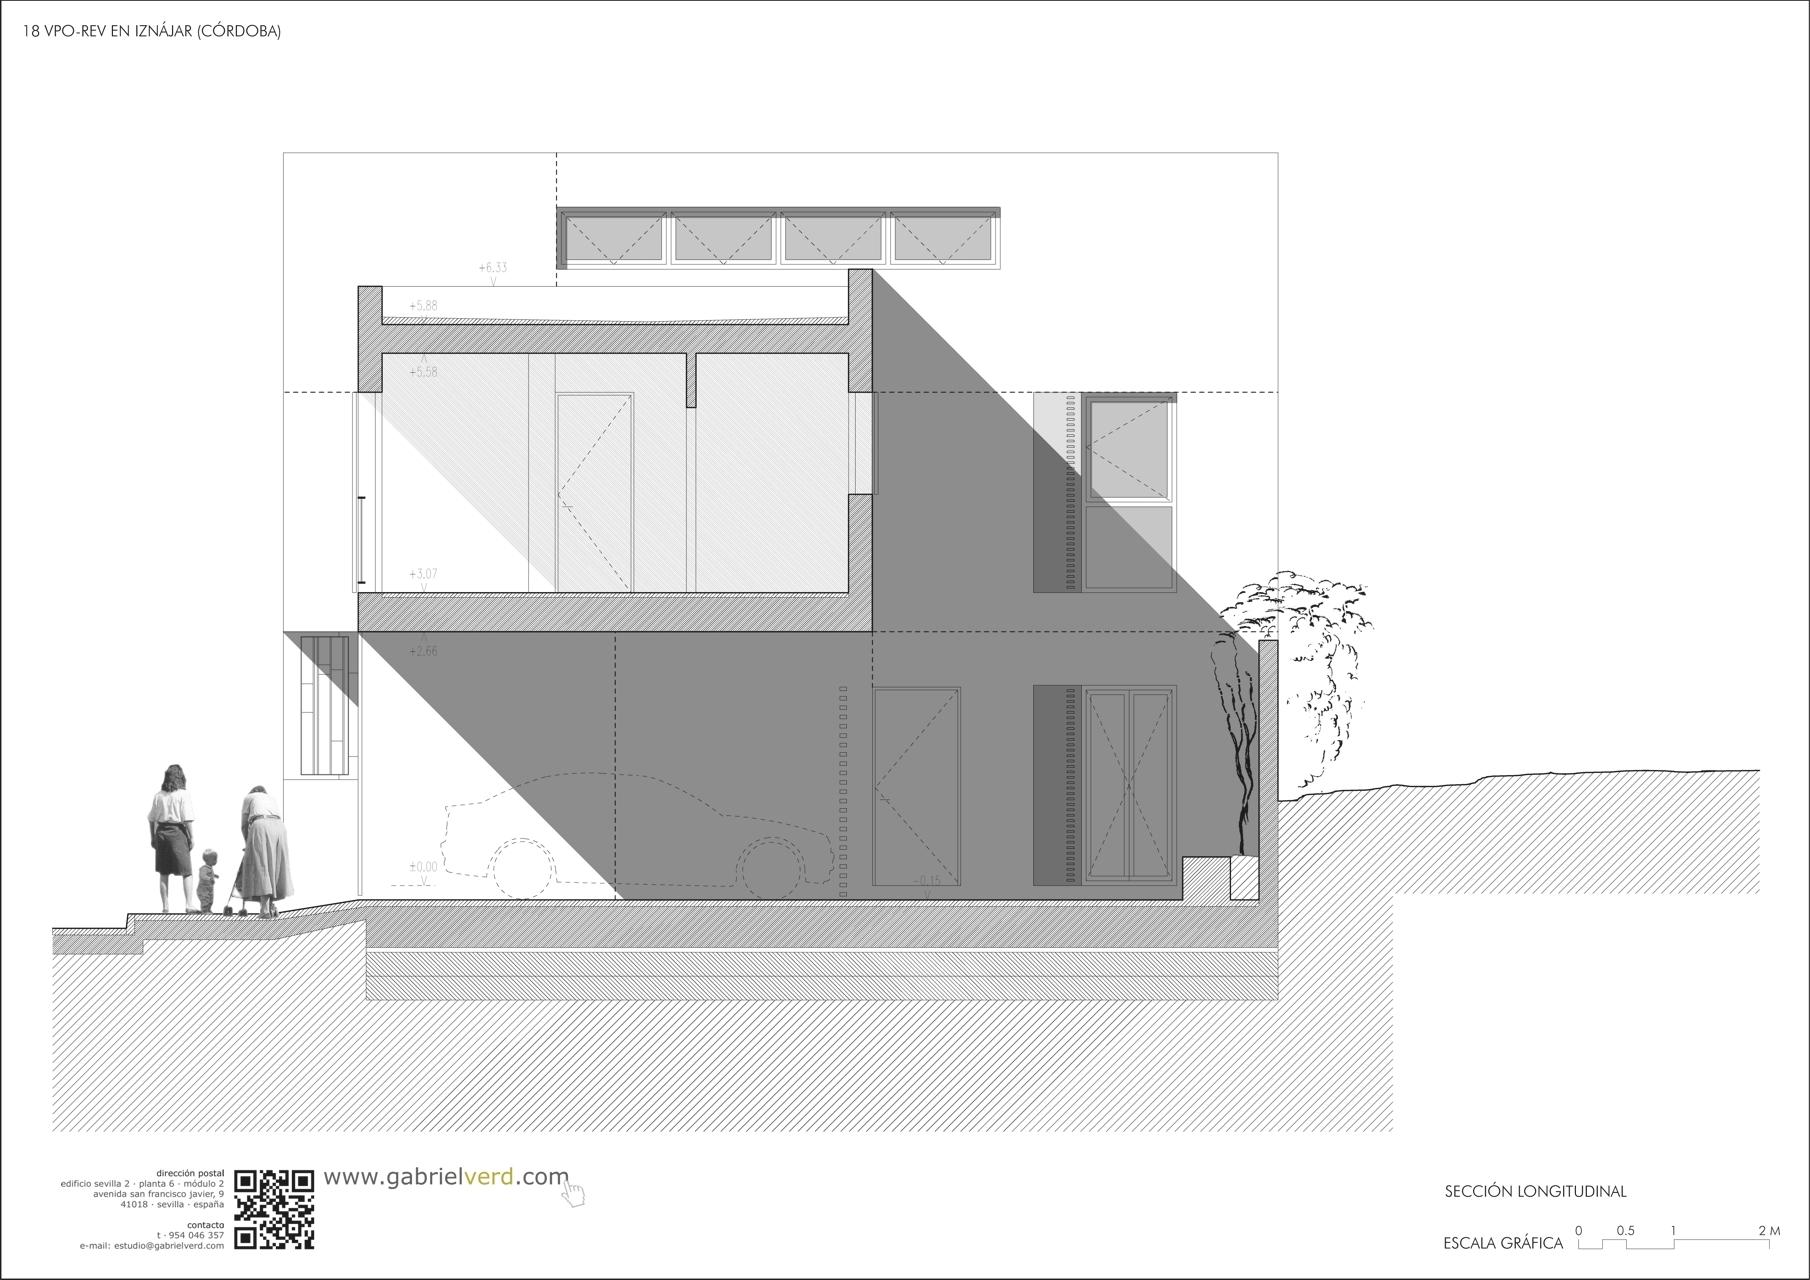 CORDOVA SOCIAL HOUSING SECTION 2